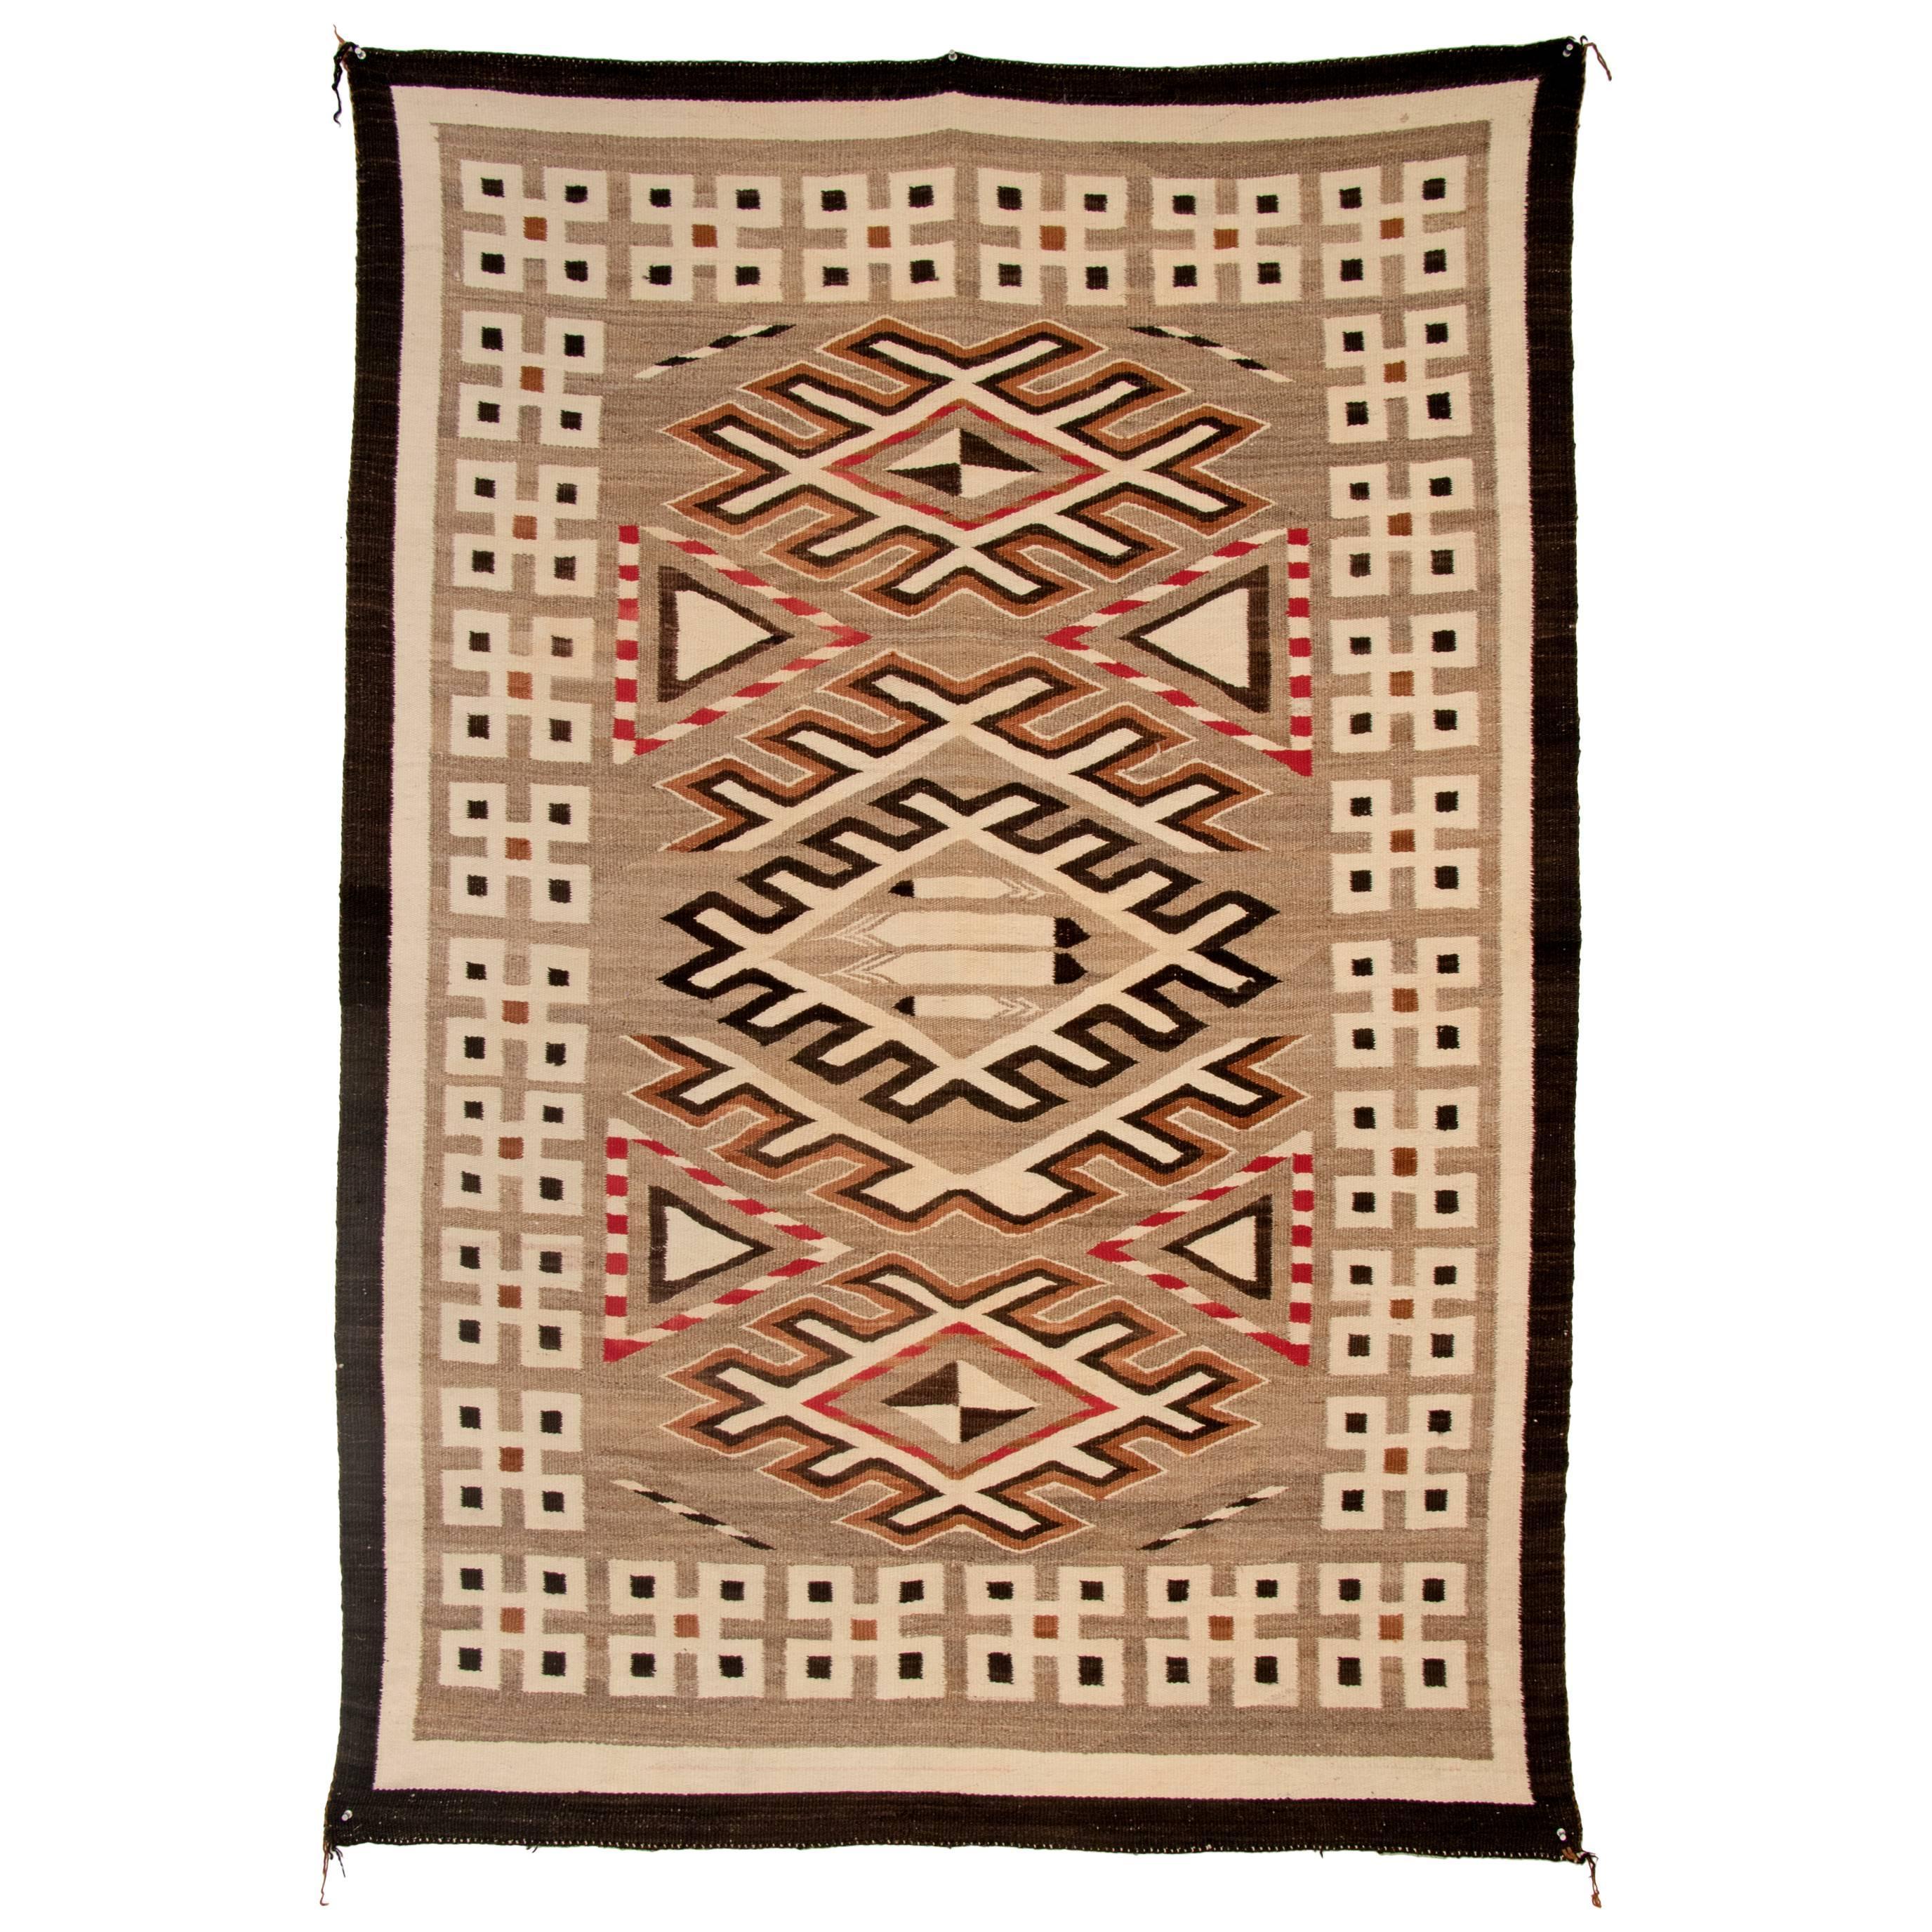 Vintage Navajo Pictorial Rug, Hand-Woven Wool, Gray, Brown, Ivory, Black & Red